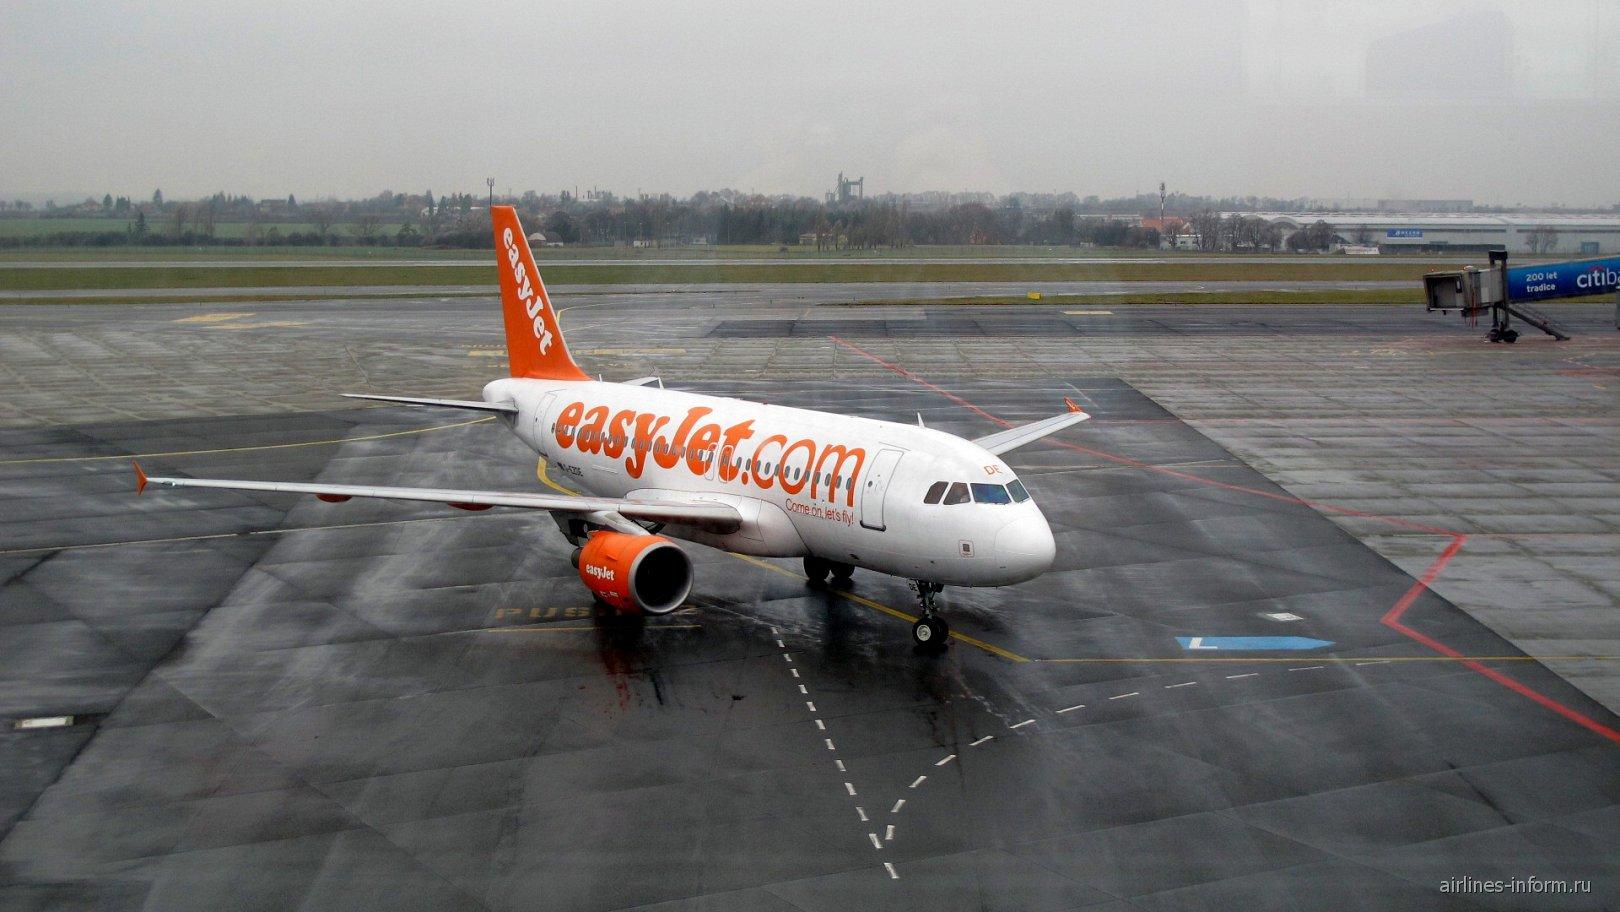 Airbus A319 авиакомпании easyJet в аэропорту Праги